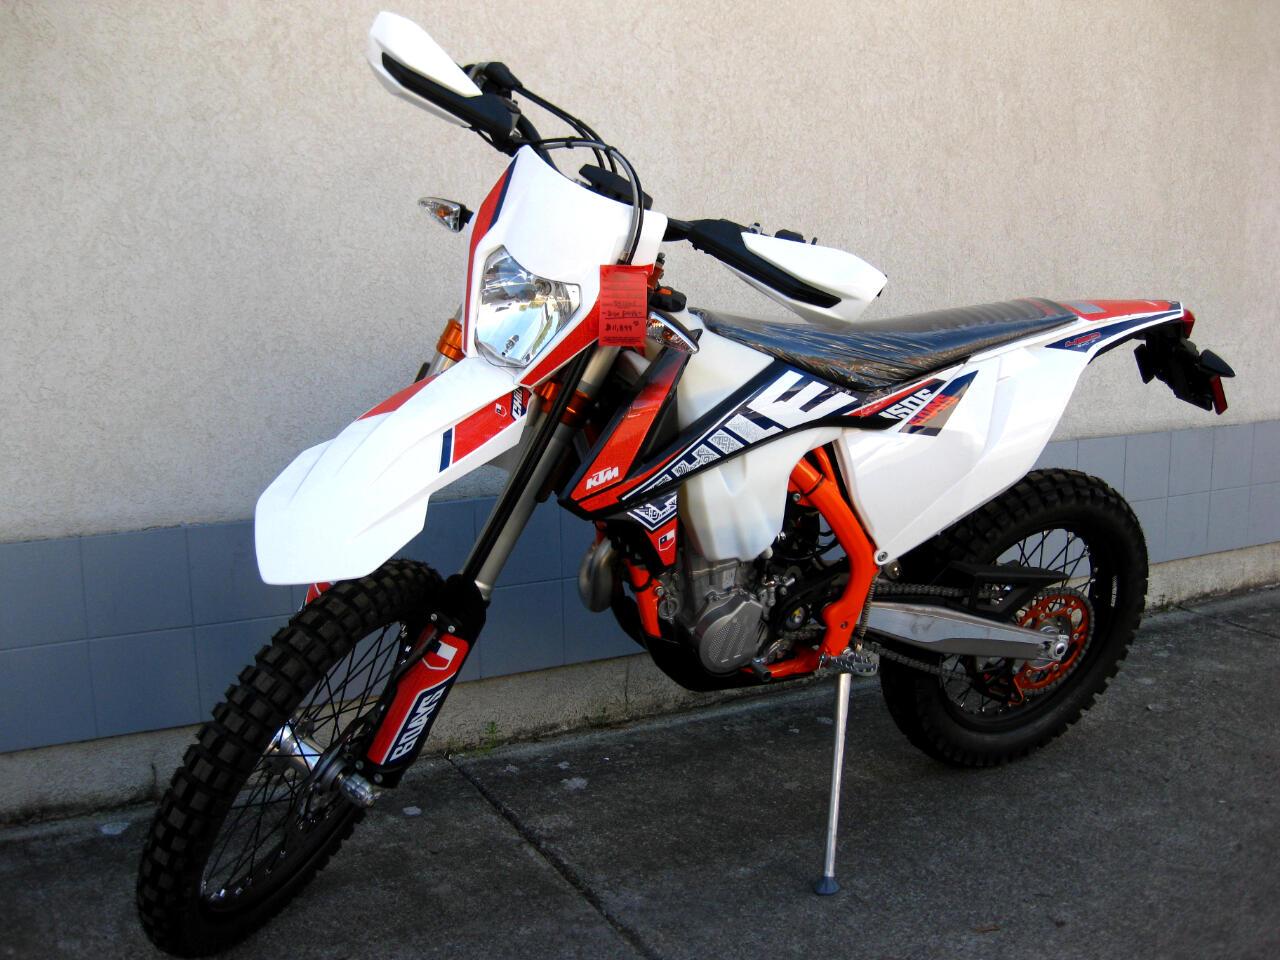 2019 KTM 450 EXC-F